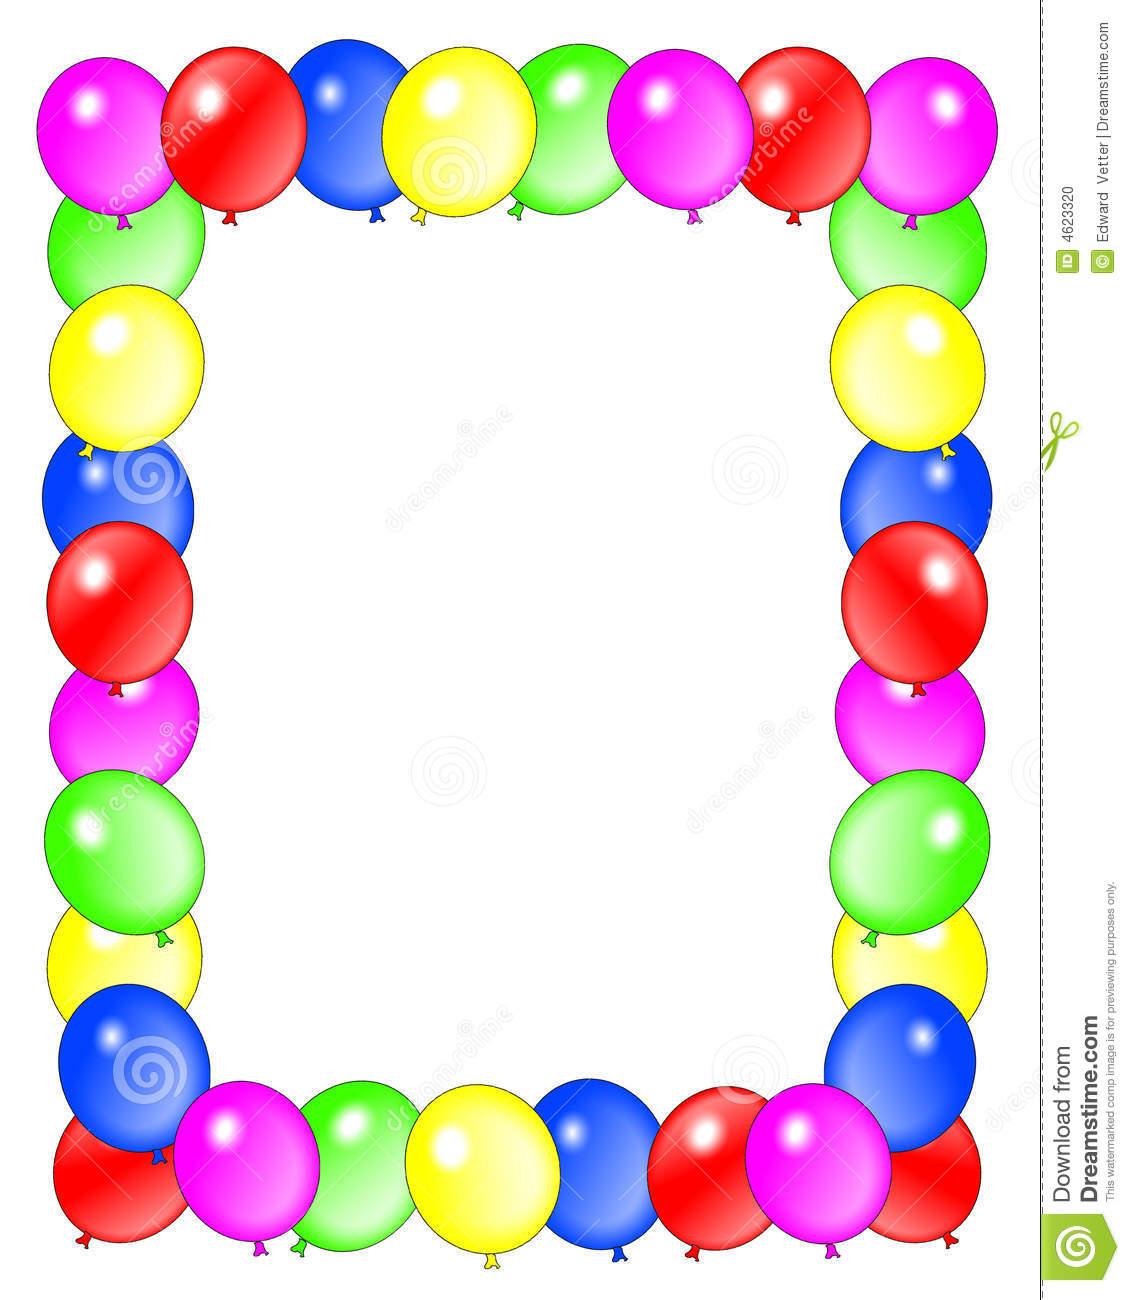 birthday clip art borders-birthday clip art borders-6